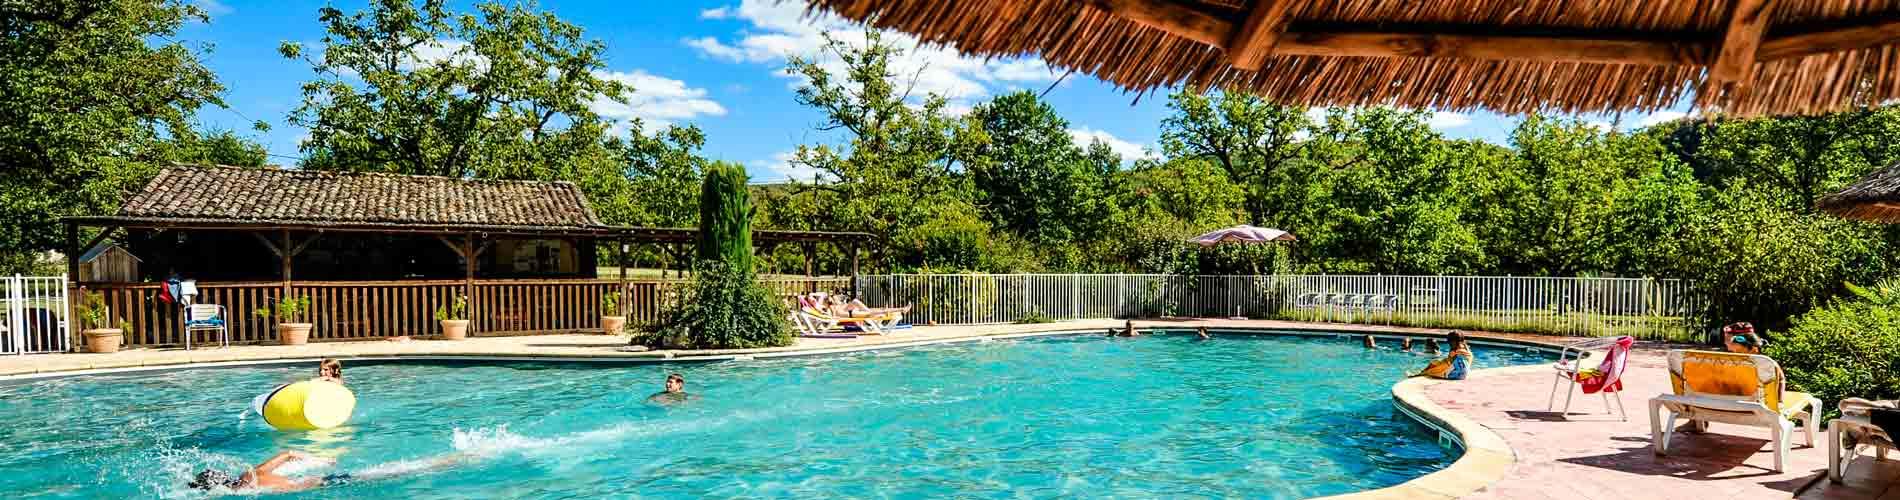 Camping lot avec piscine camping avec espace quatique for Camping blois avec piscine